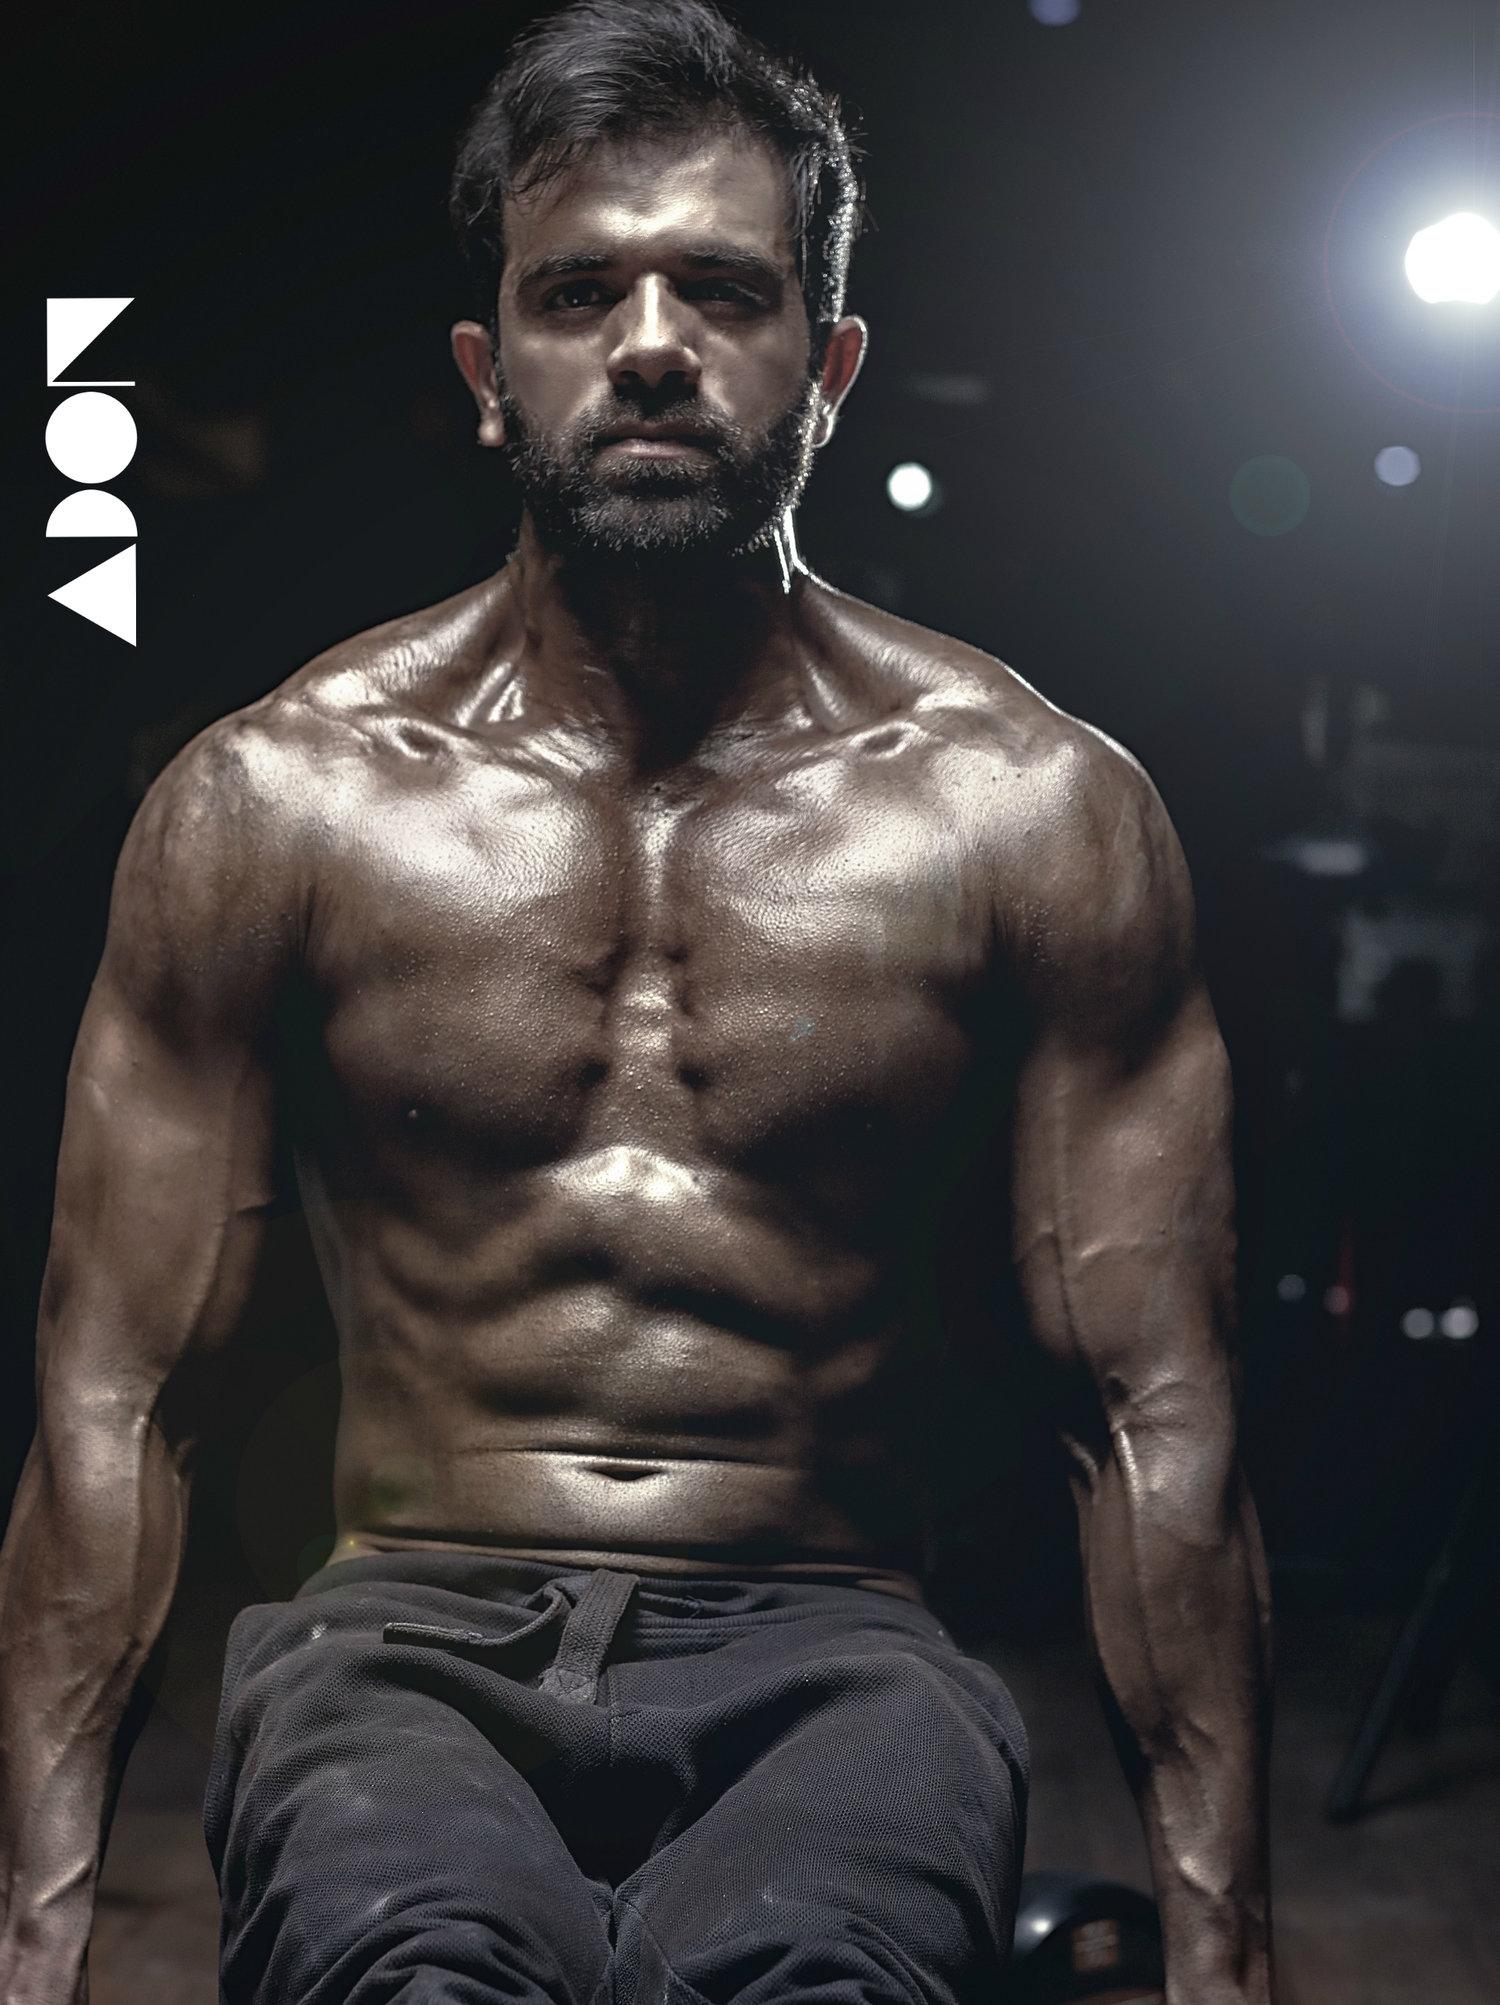 Adon Exclusive: Model Atiq By Zohaib